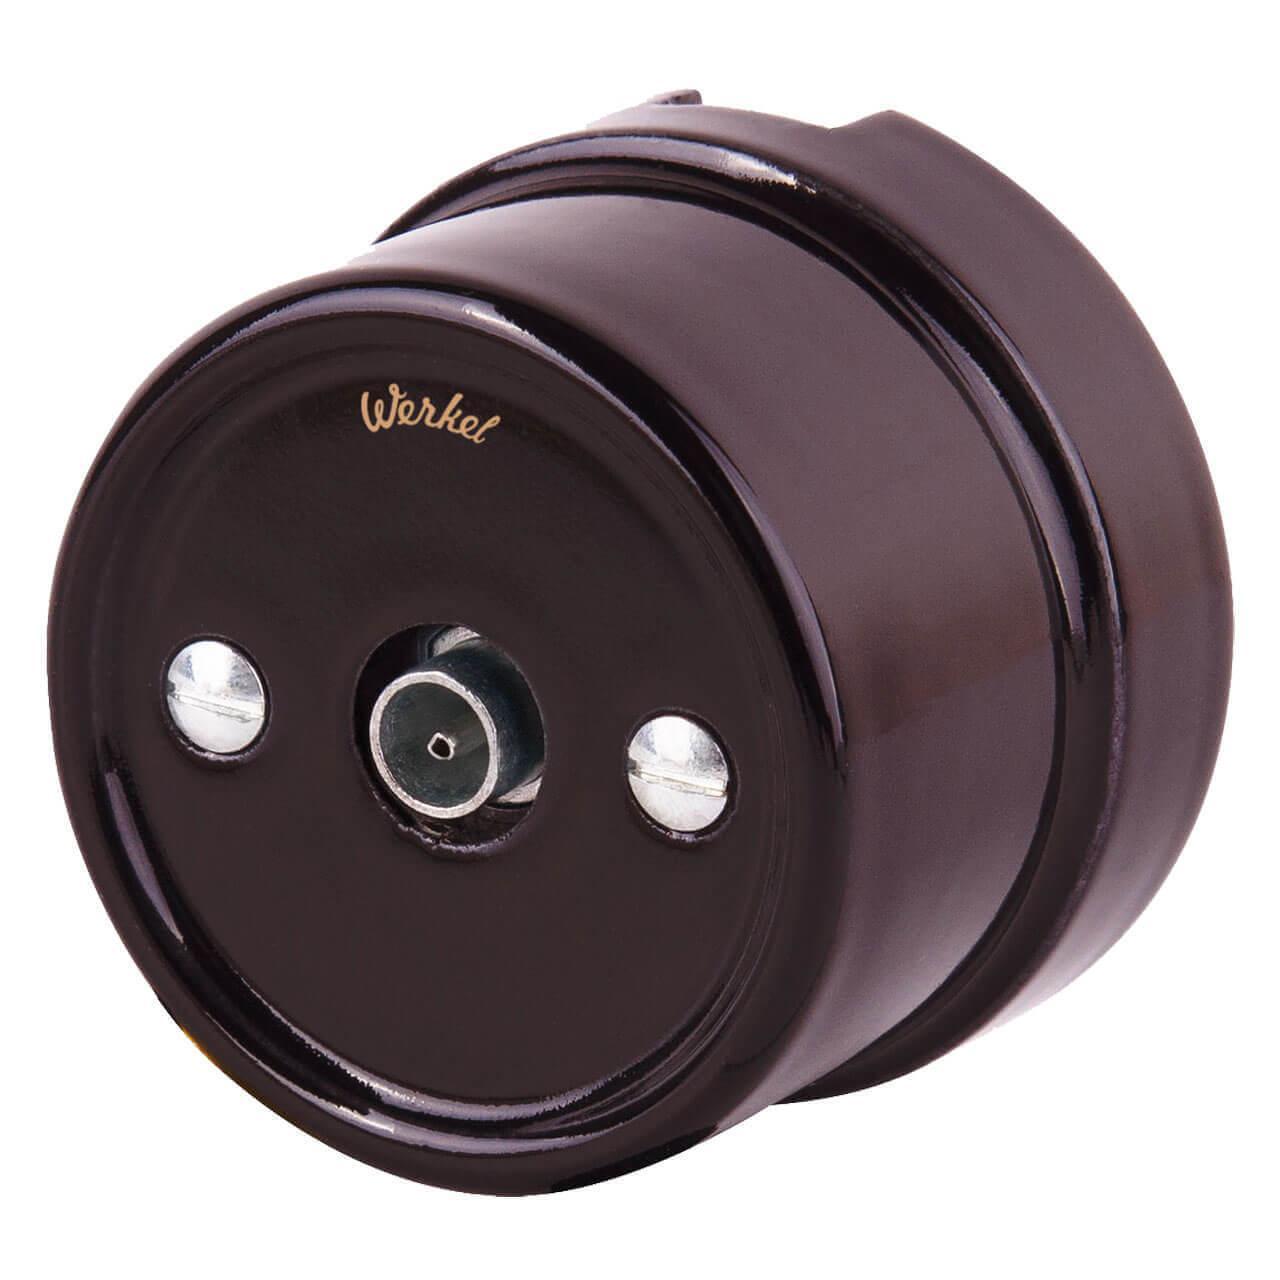 ТВ розетка Werkel Retro коричневая WL18-02-05 4690389100734